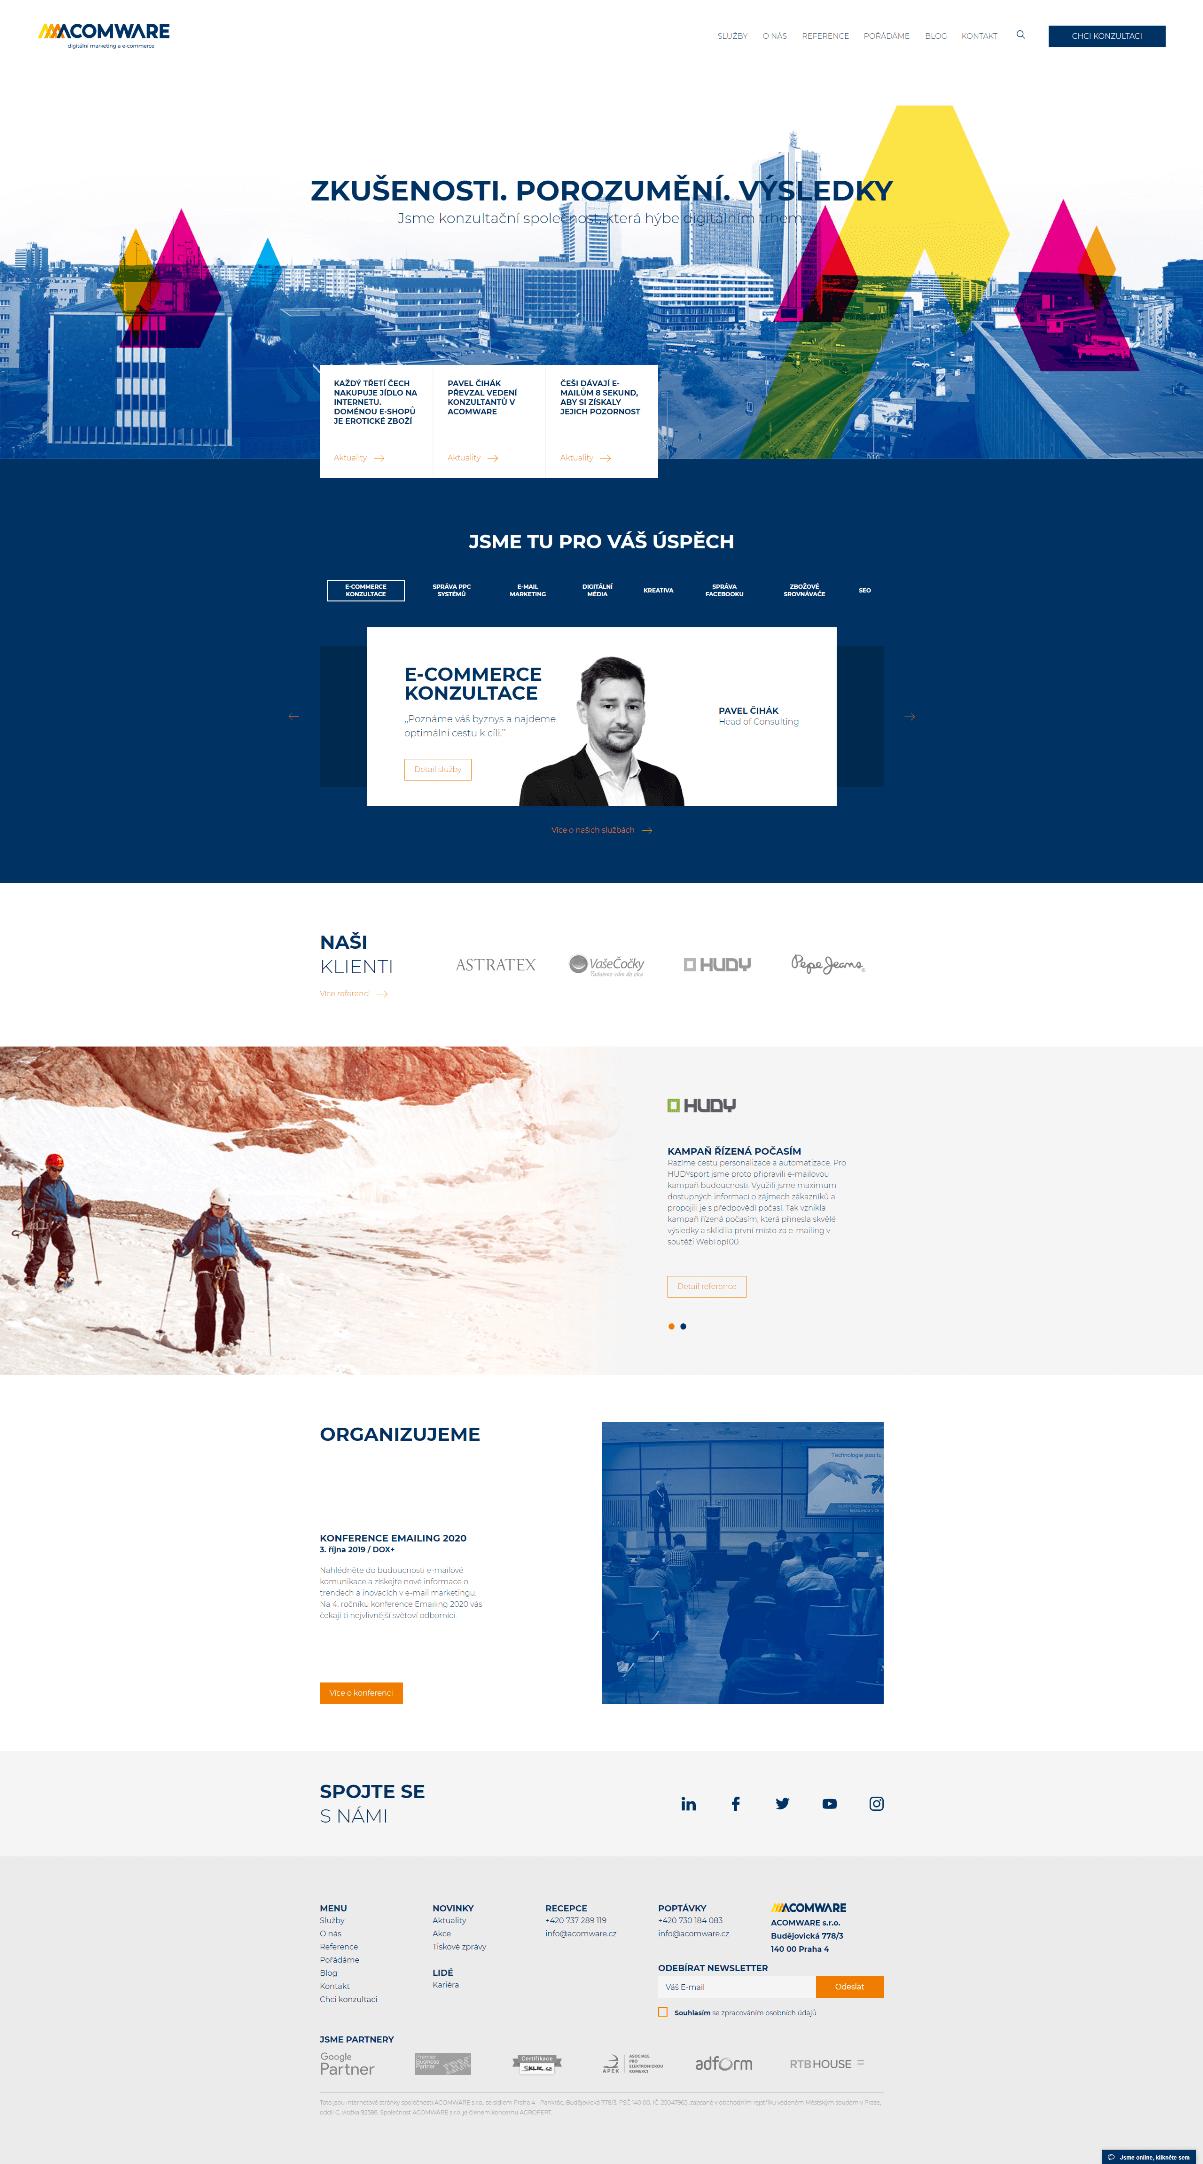 Acomware-agentura-ukazka-homepage